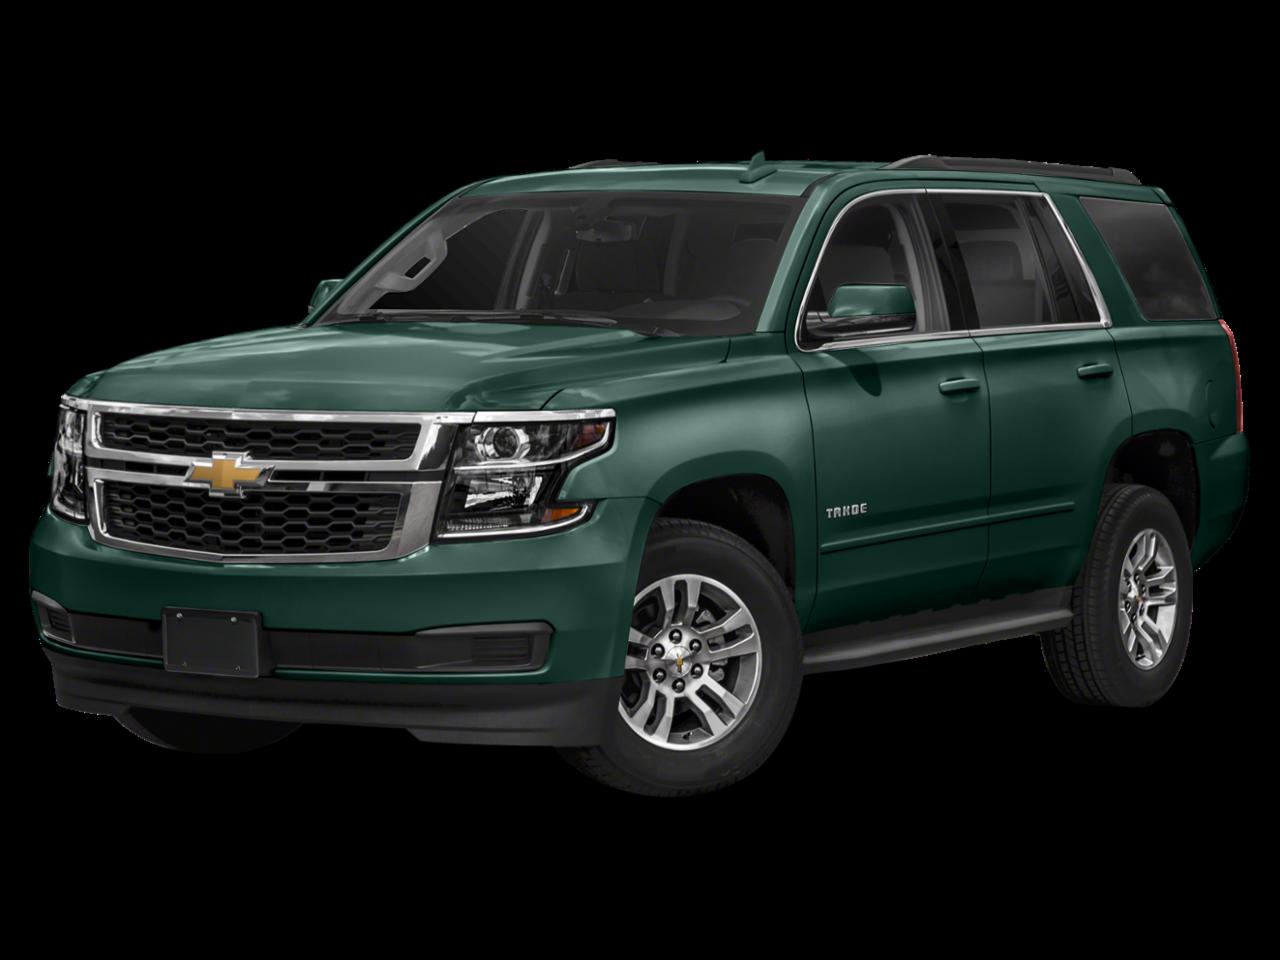 Chevrolet 2020 Tahoe Commercial